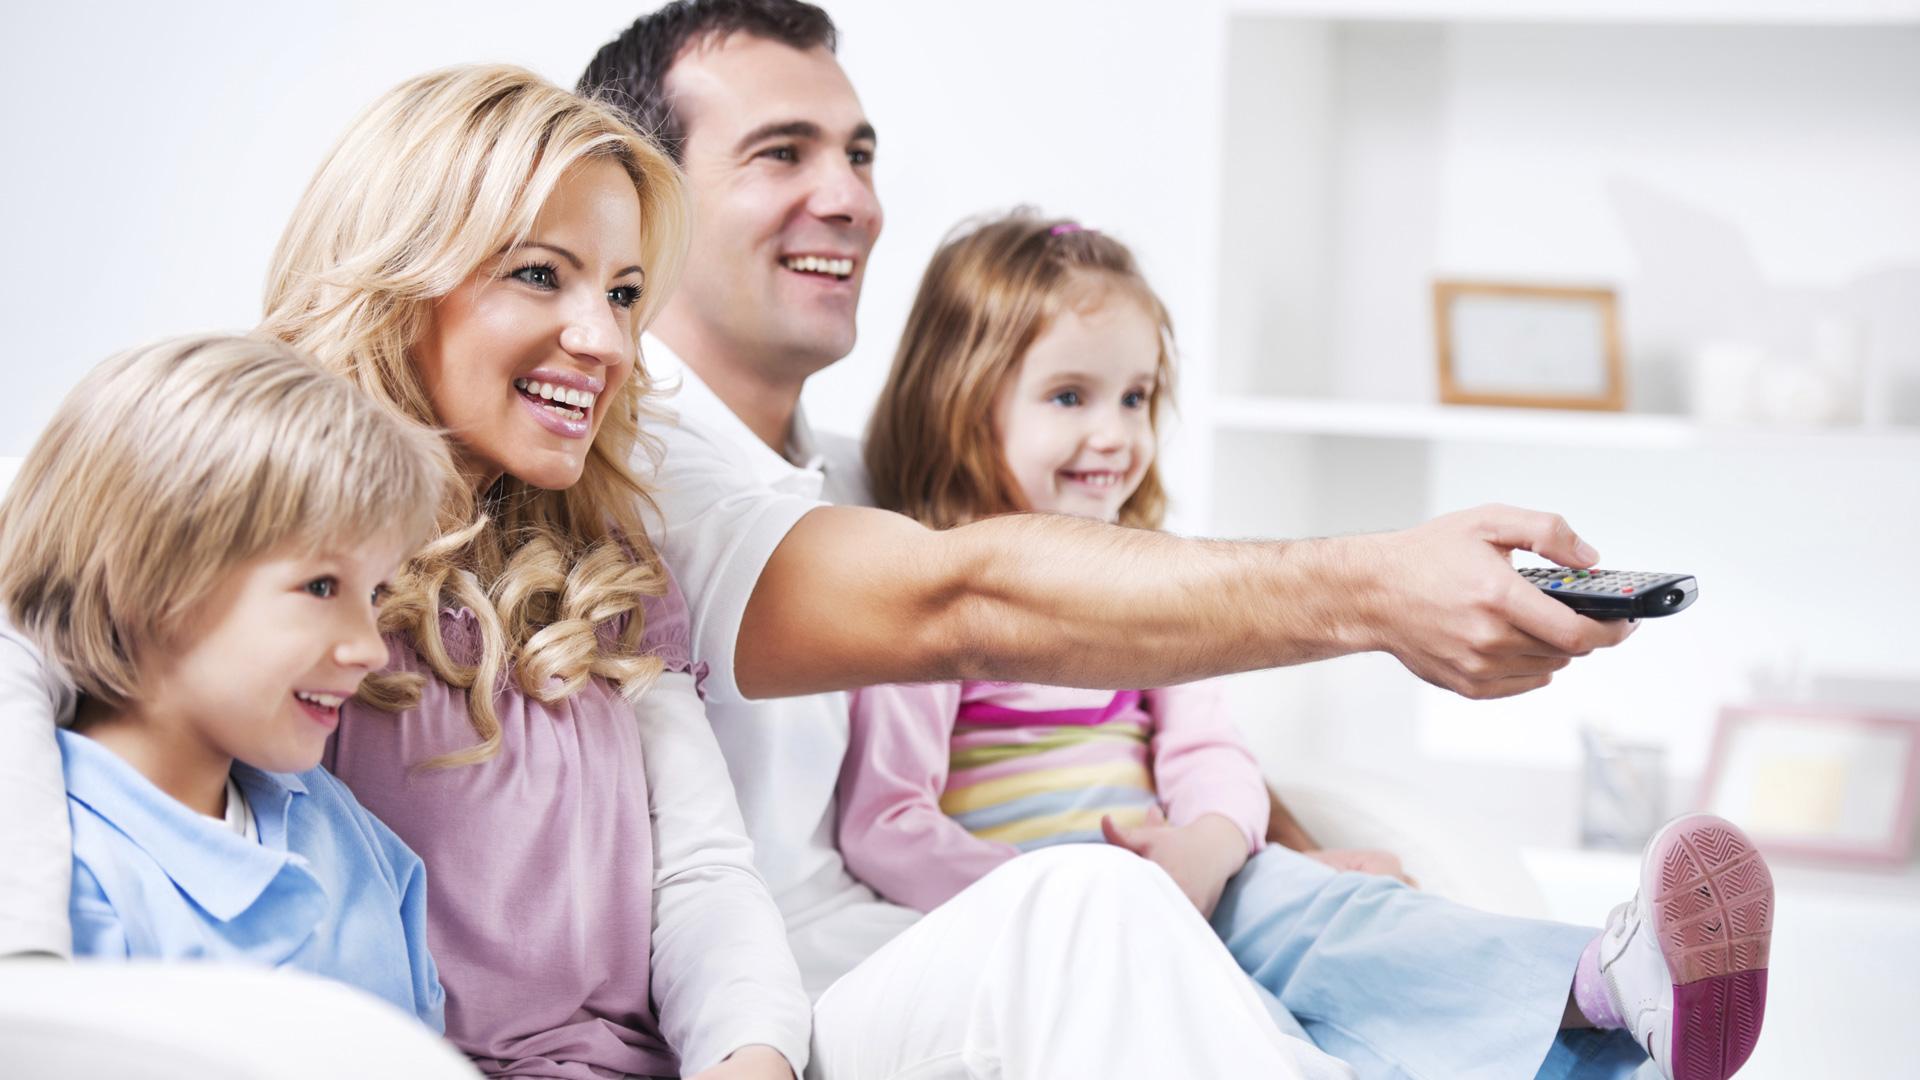 sheknows entertainment recipes parenting amp love advice